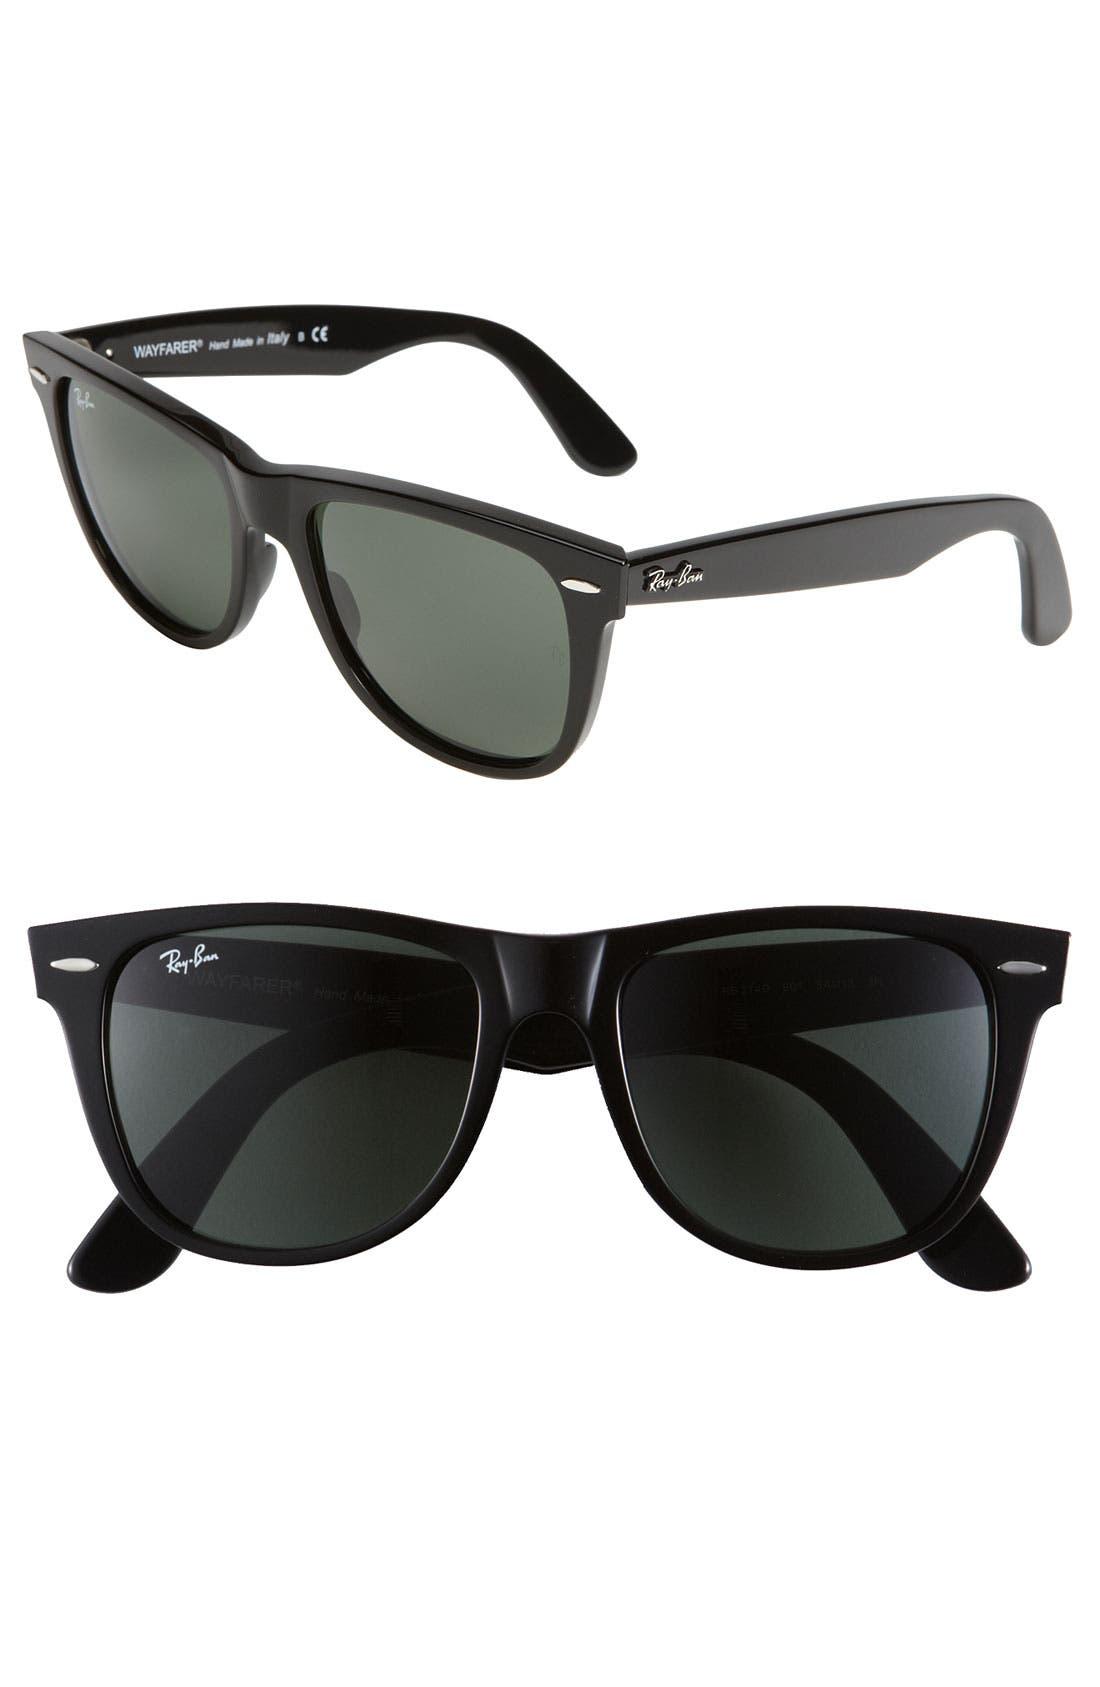 Alternate Image 1 Selected - Ray-Ban Large Classic Wayfarer 54mm Sunglasses